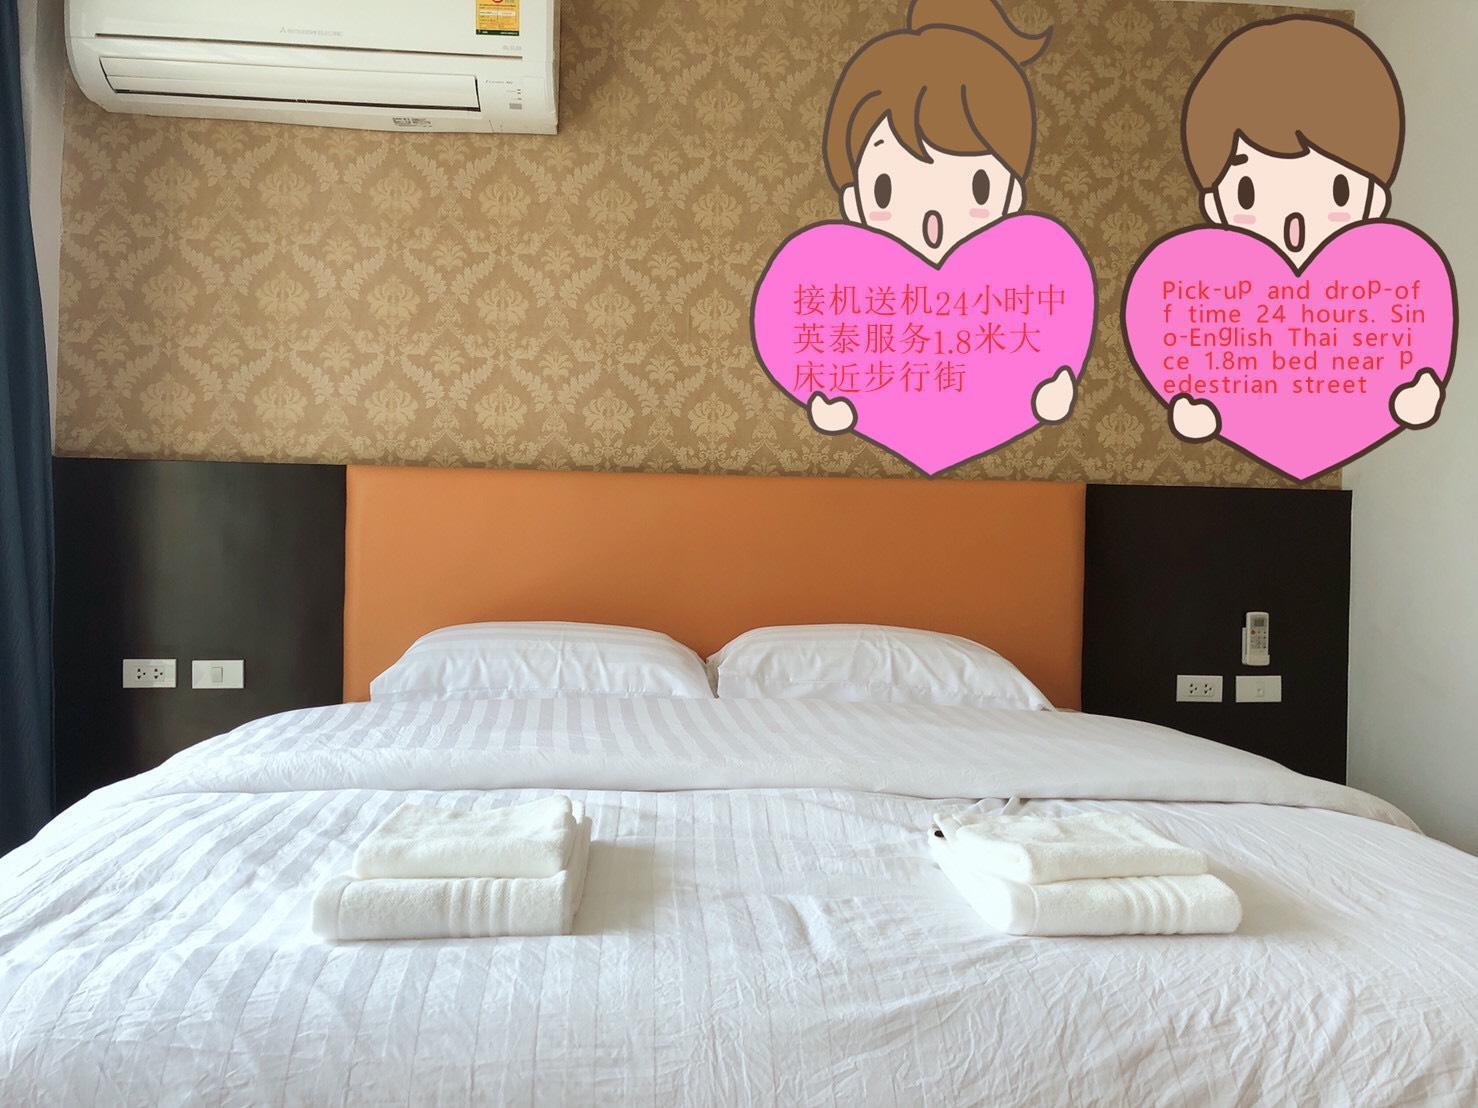 [HW]1.8m Double Room 36m2 Large Room  305 อพาร์ตเมนต์ 1 ห้องนอน 1 ห้องน้ำส่วนตัว ขนาด 35 ตร.ม. – พัทยากลาง